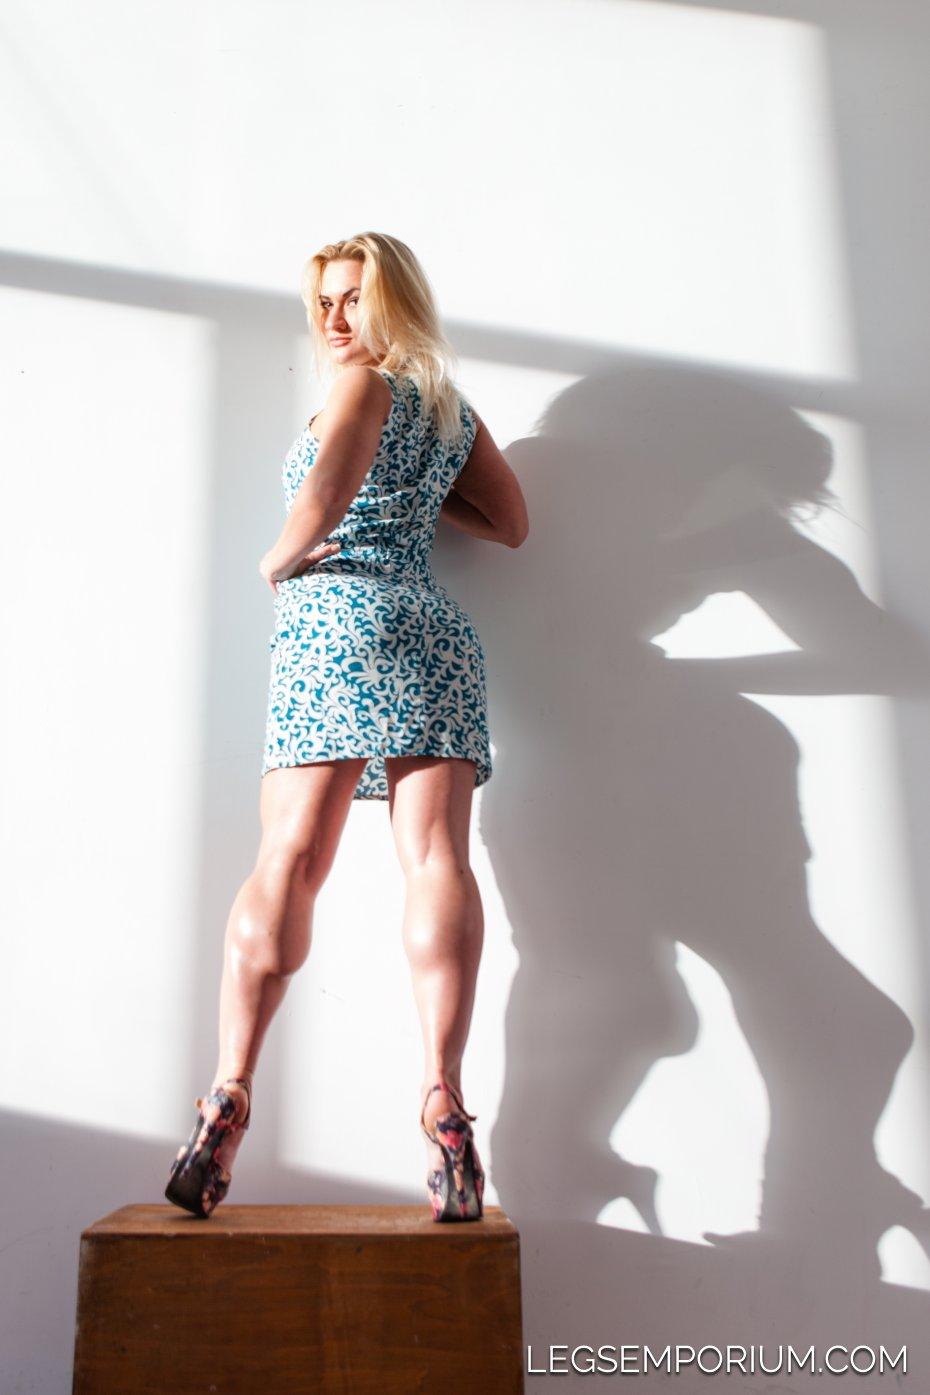 Legs Emporium: Shapeliest Sexiest Legs and Calves Debut!